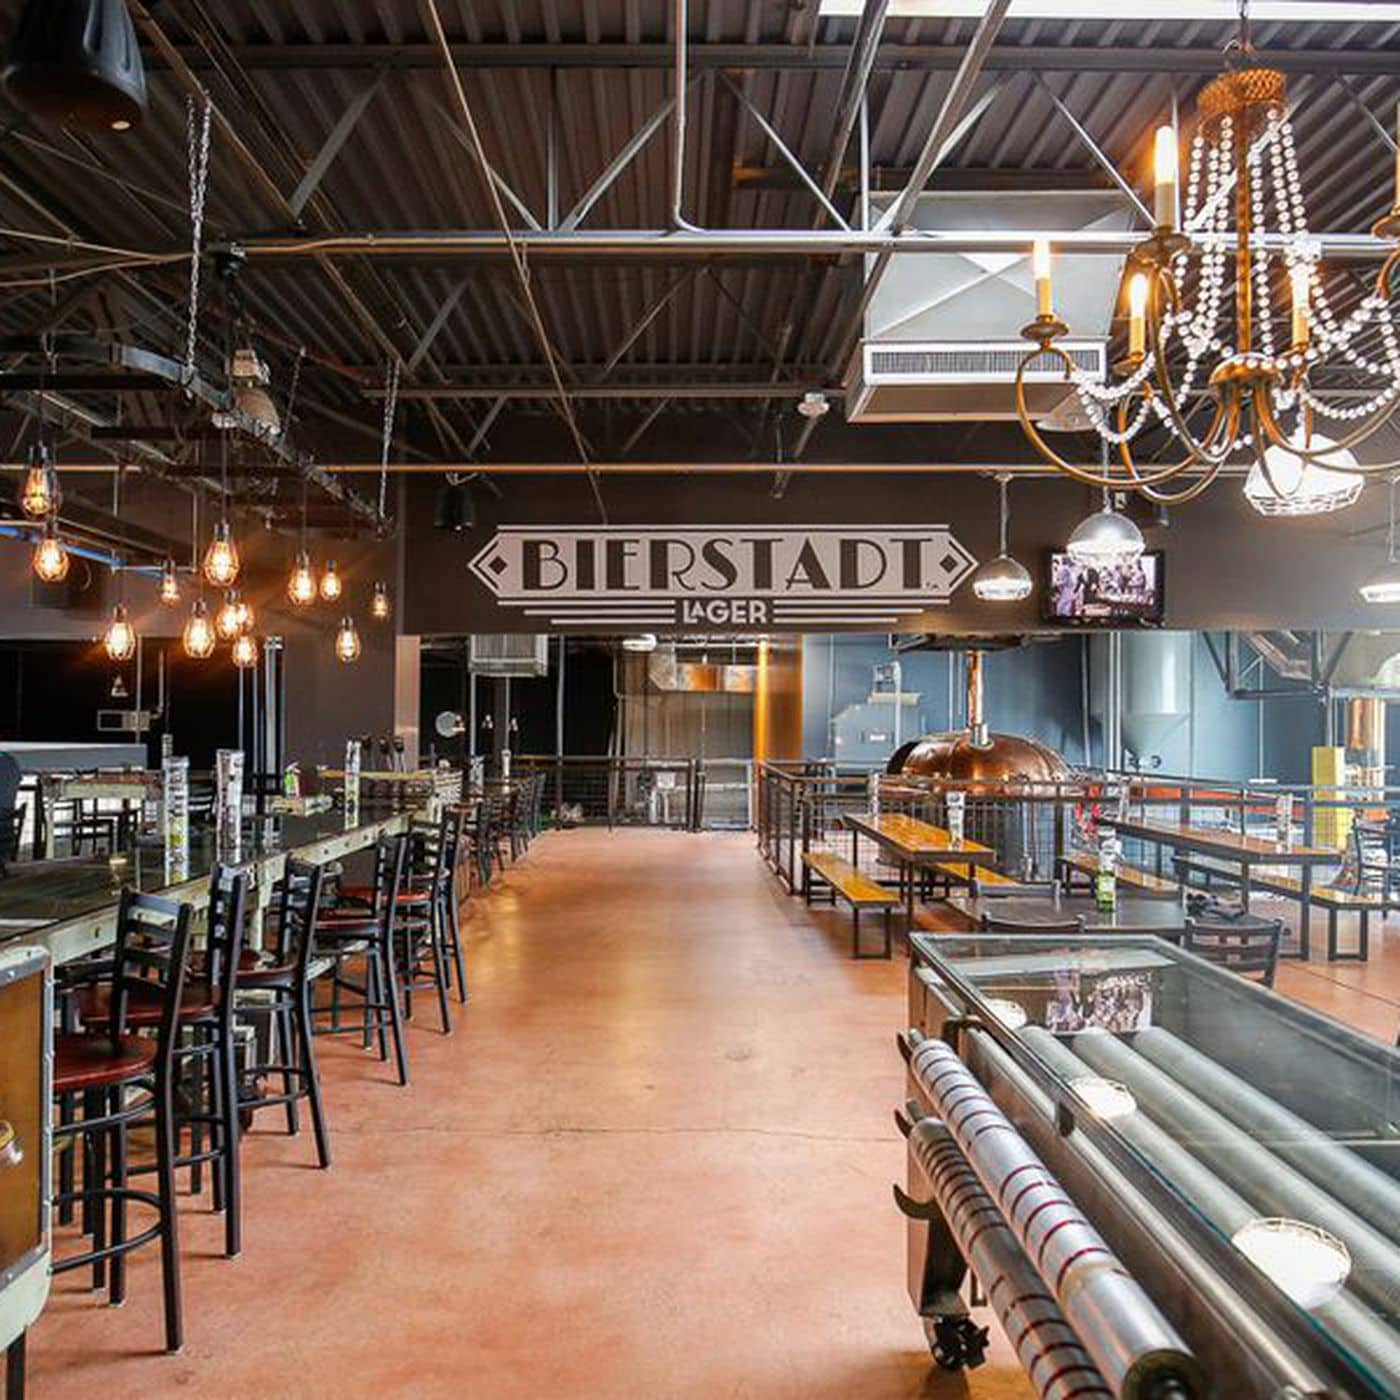 Bierstadt Lagerhaus - One of many breweries in Denver with Food